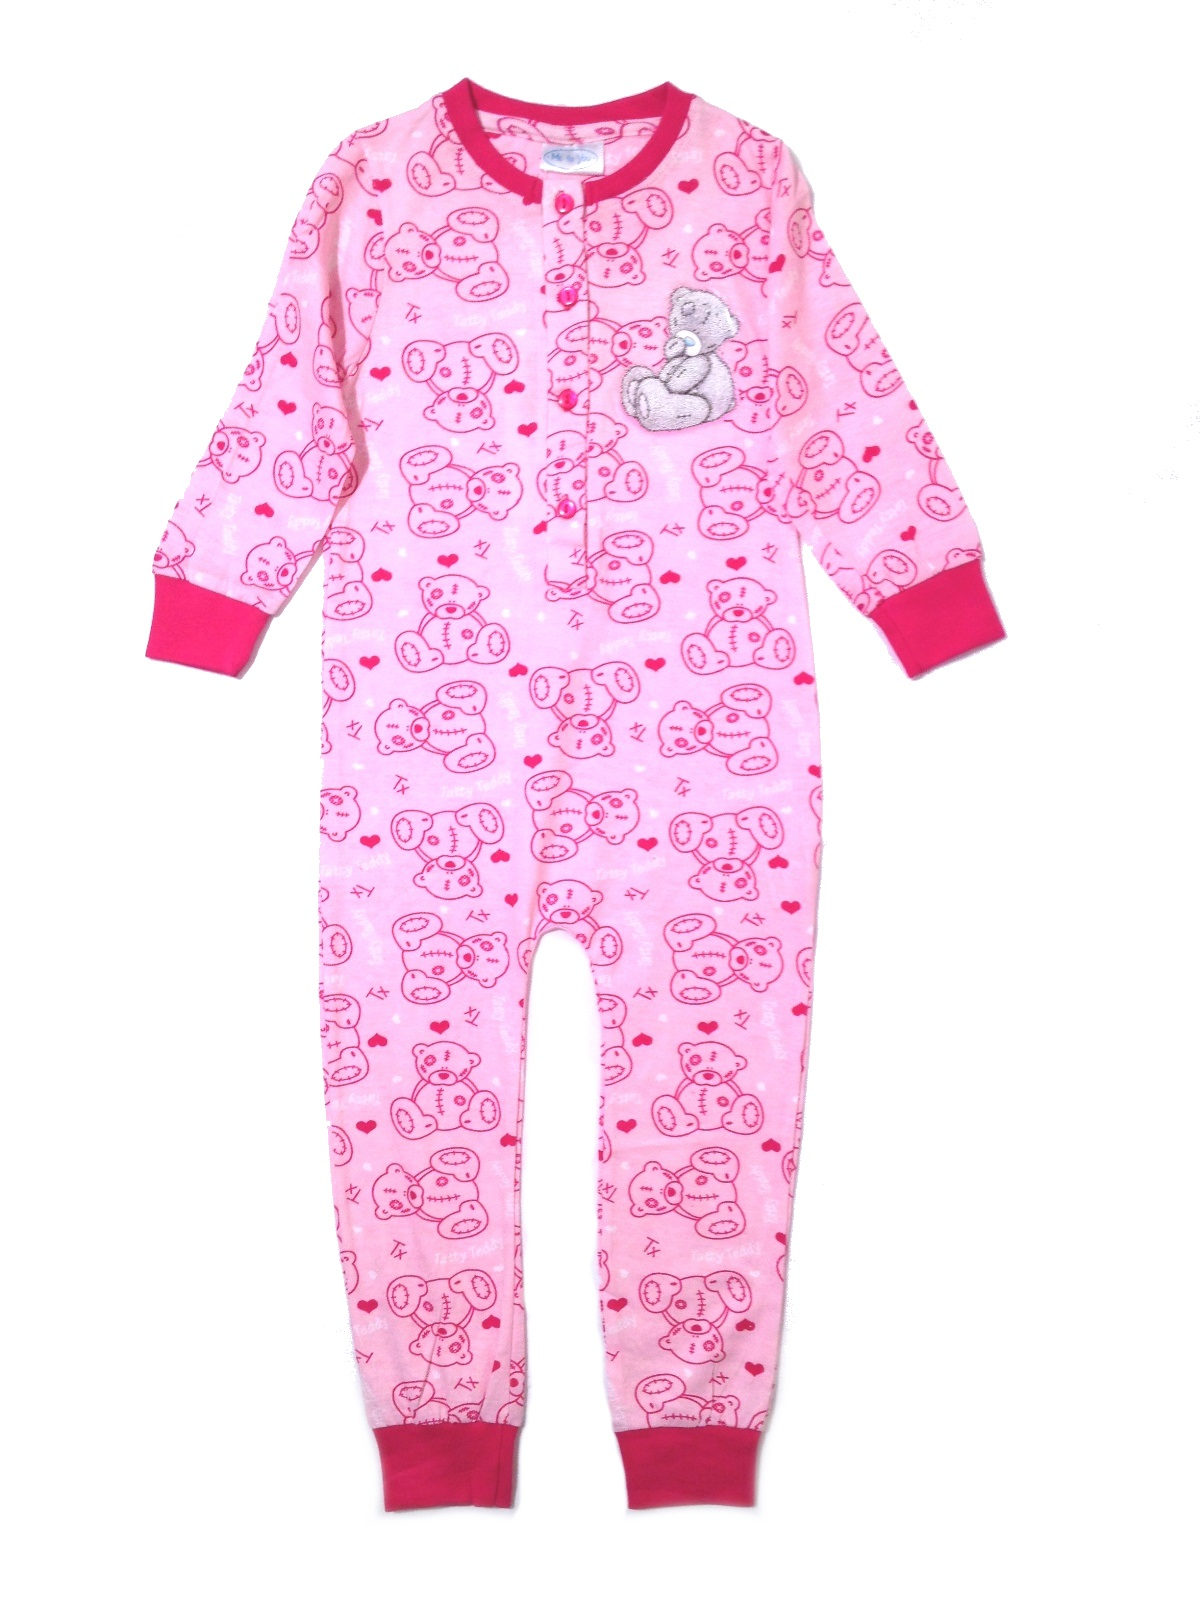 enfants filles me to you tatty teddy grenouill re pyjamas. Black Bedroom Furniture Sets. Home Design Ideas